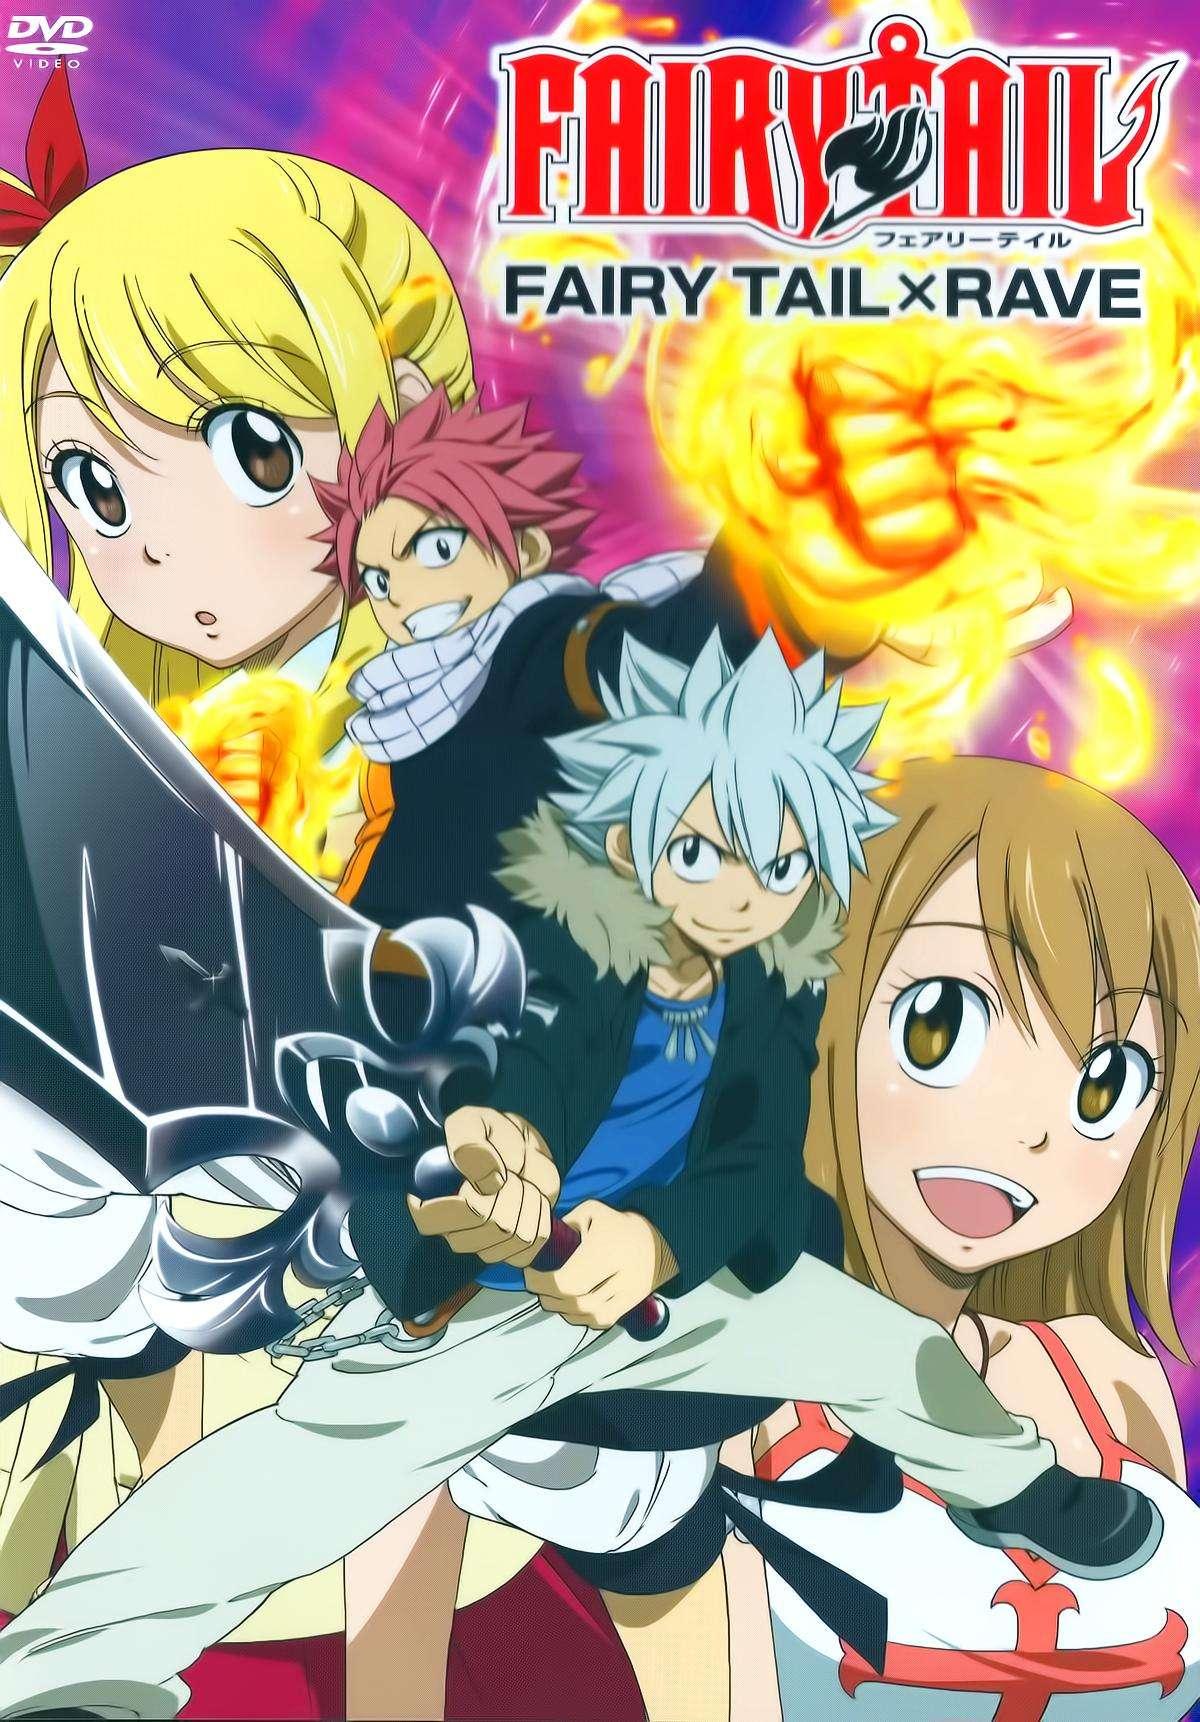 Fairy Tail x Rave (2013)